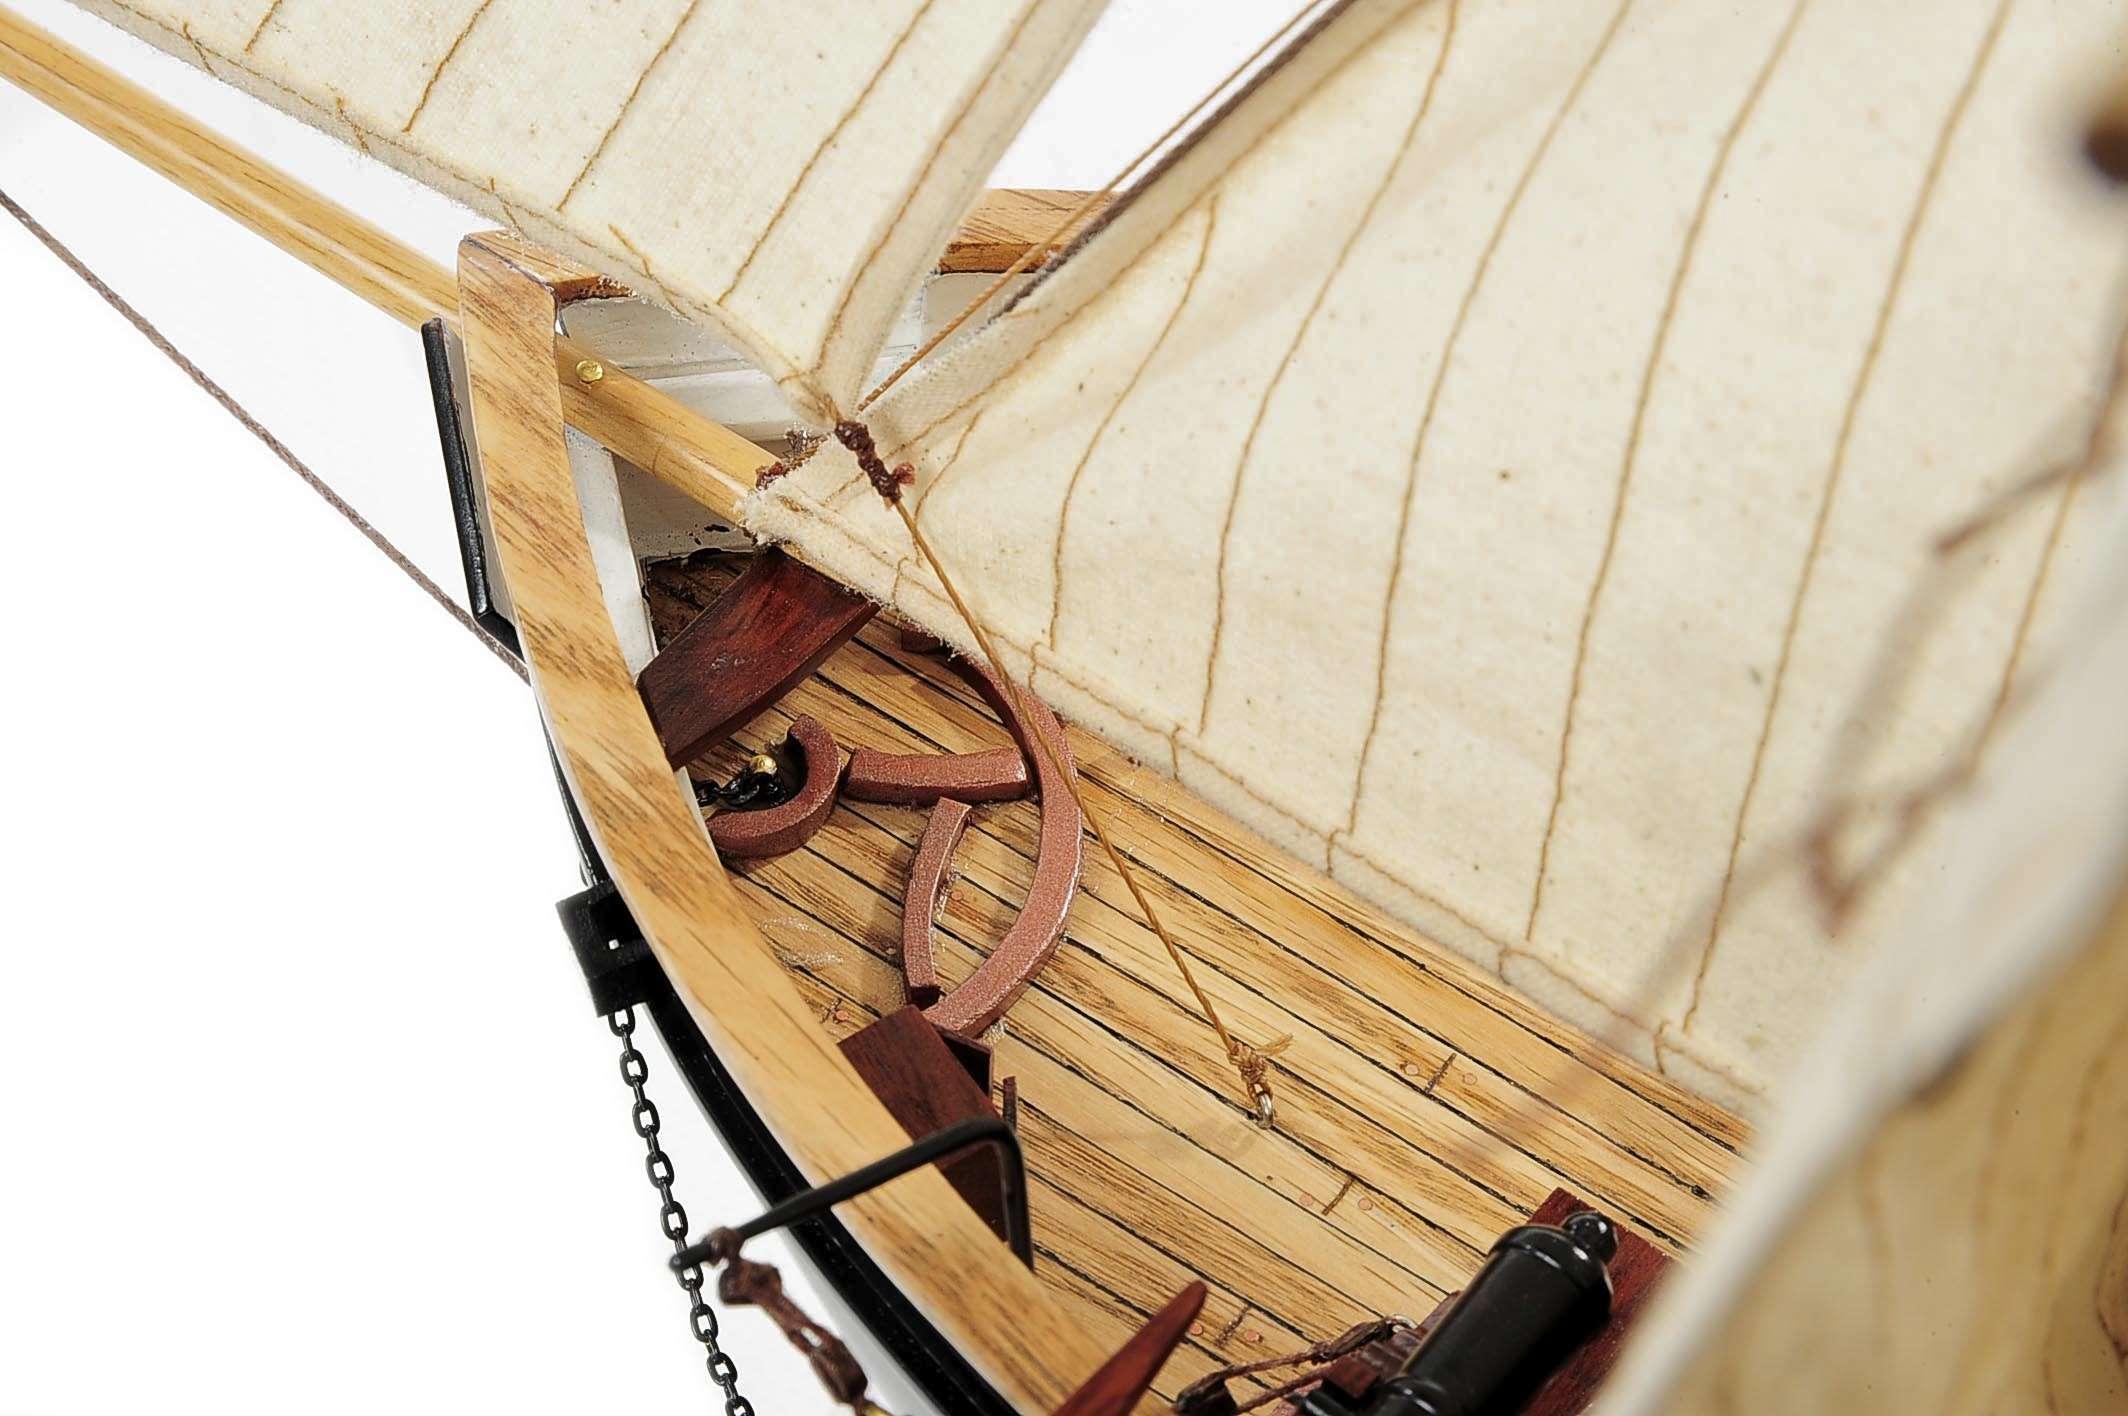 1428-4668-HMS-Cockchafer-2-Model-Boat